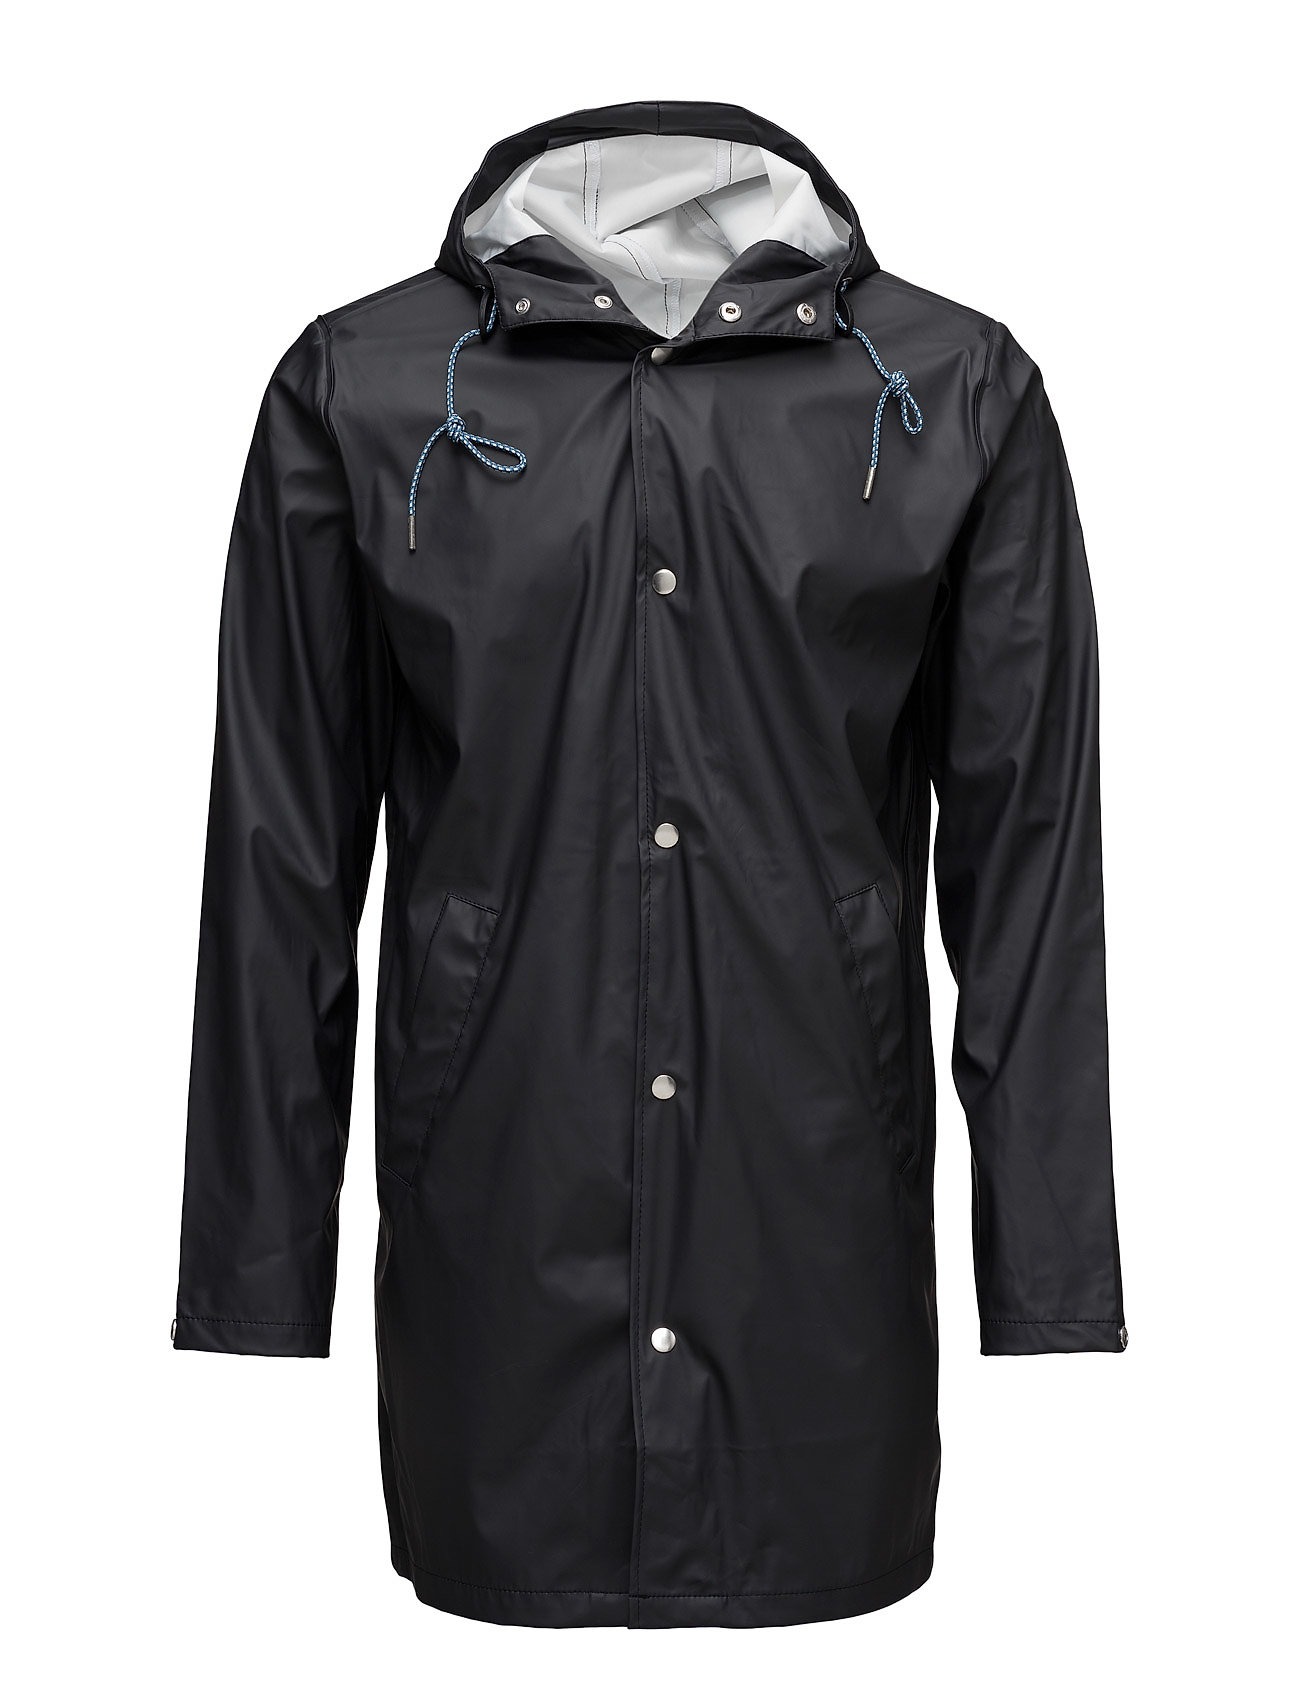 JacketphantomKnowledge Cotton Long Apparel Cotton Apparel Rain JacketphantomKnowledge Rain Long 6gy7fb